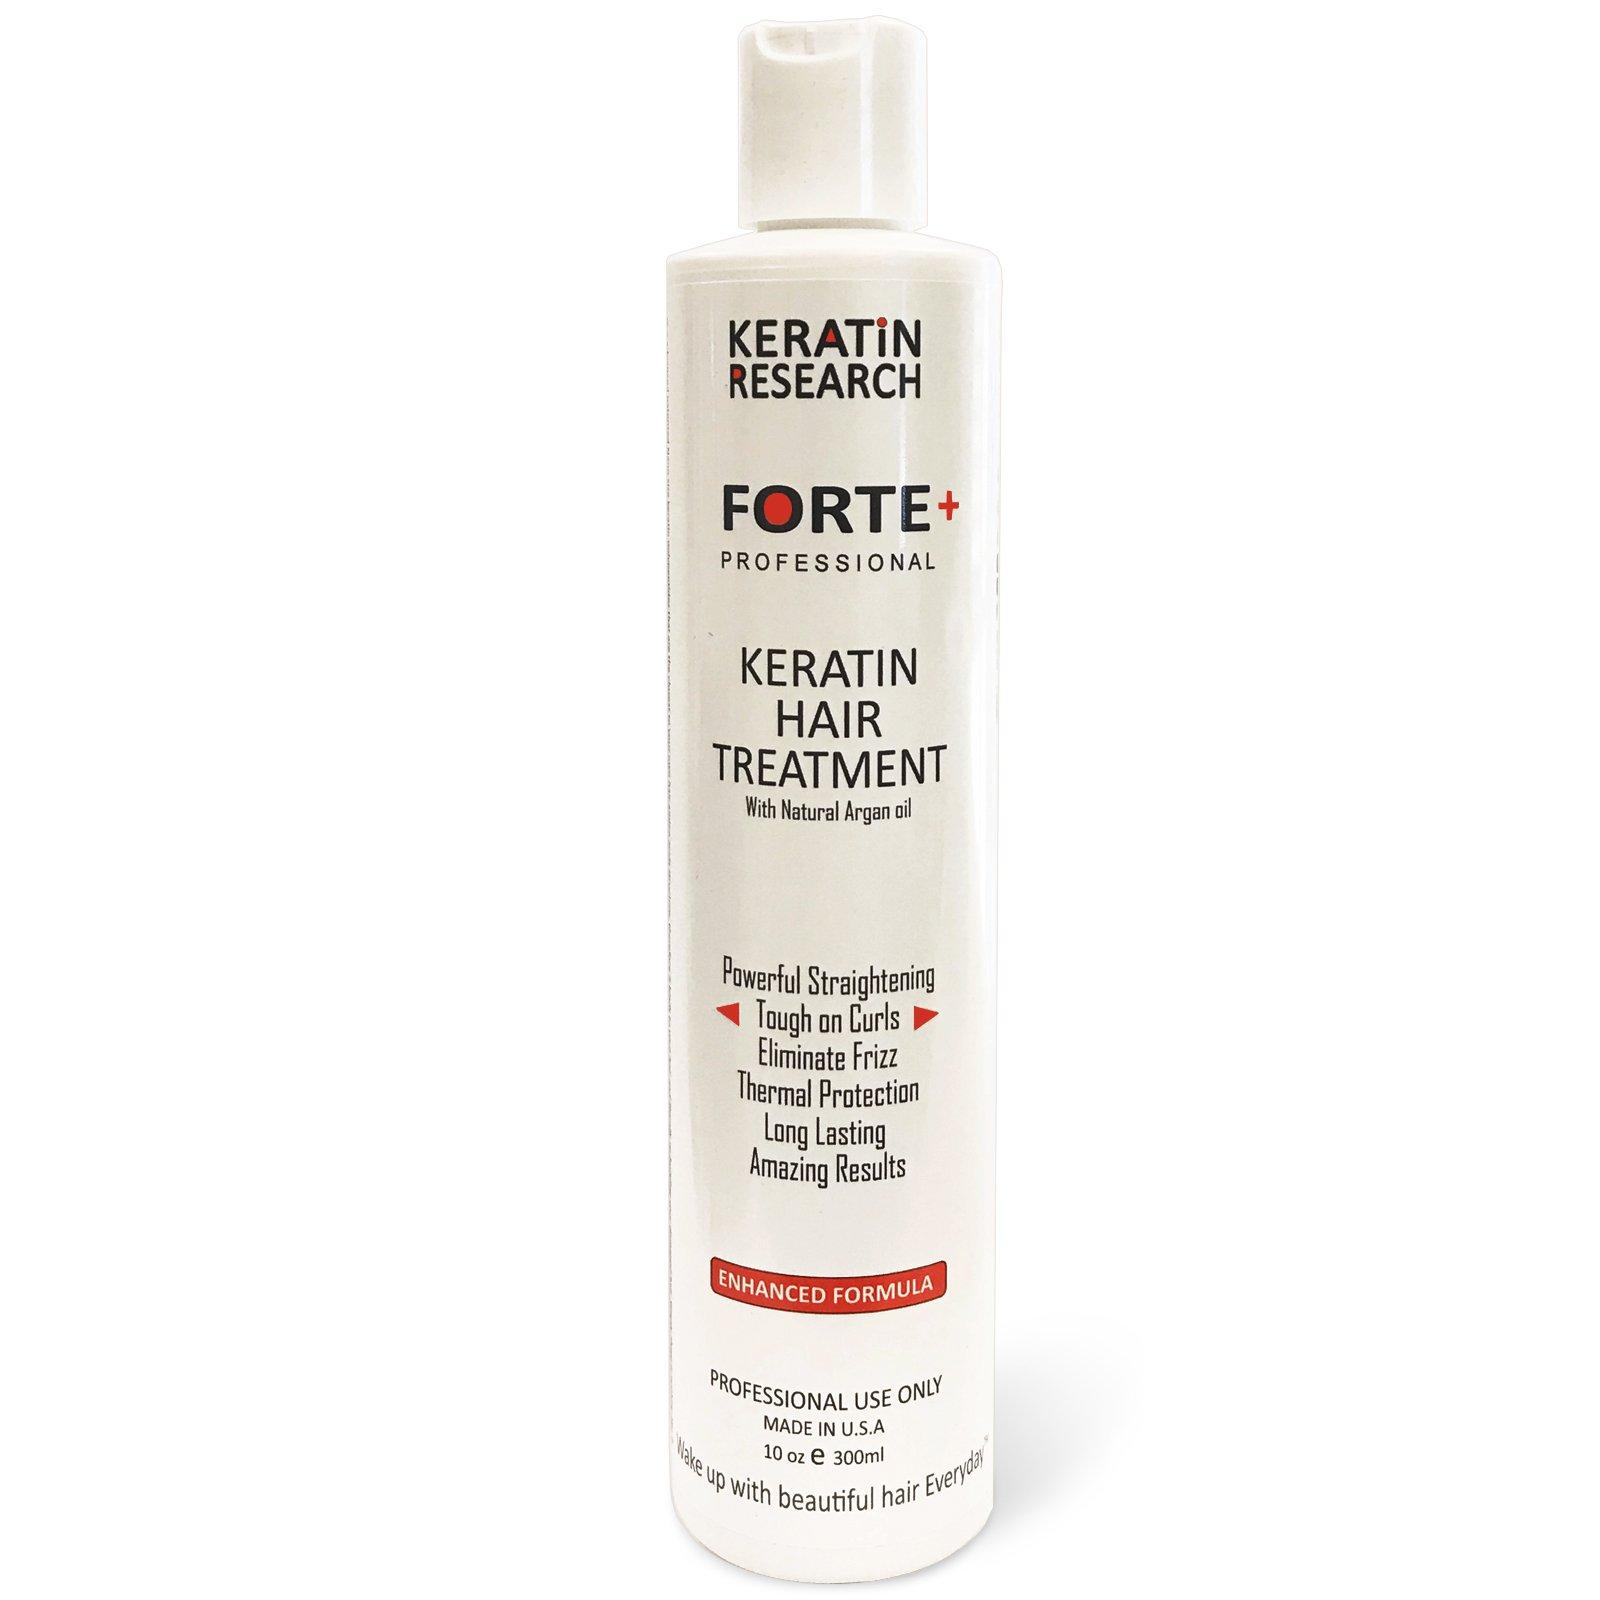 Keratin Forte Keratin Brazilian Keratin Hair Blowout Treatment Extra Strength 300ml Enhanced Formula for Curly Hair By Keratin Research Queratina Keratina Brasilera Forte